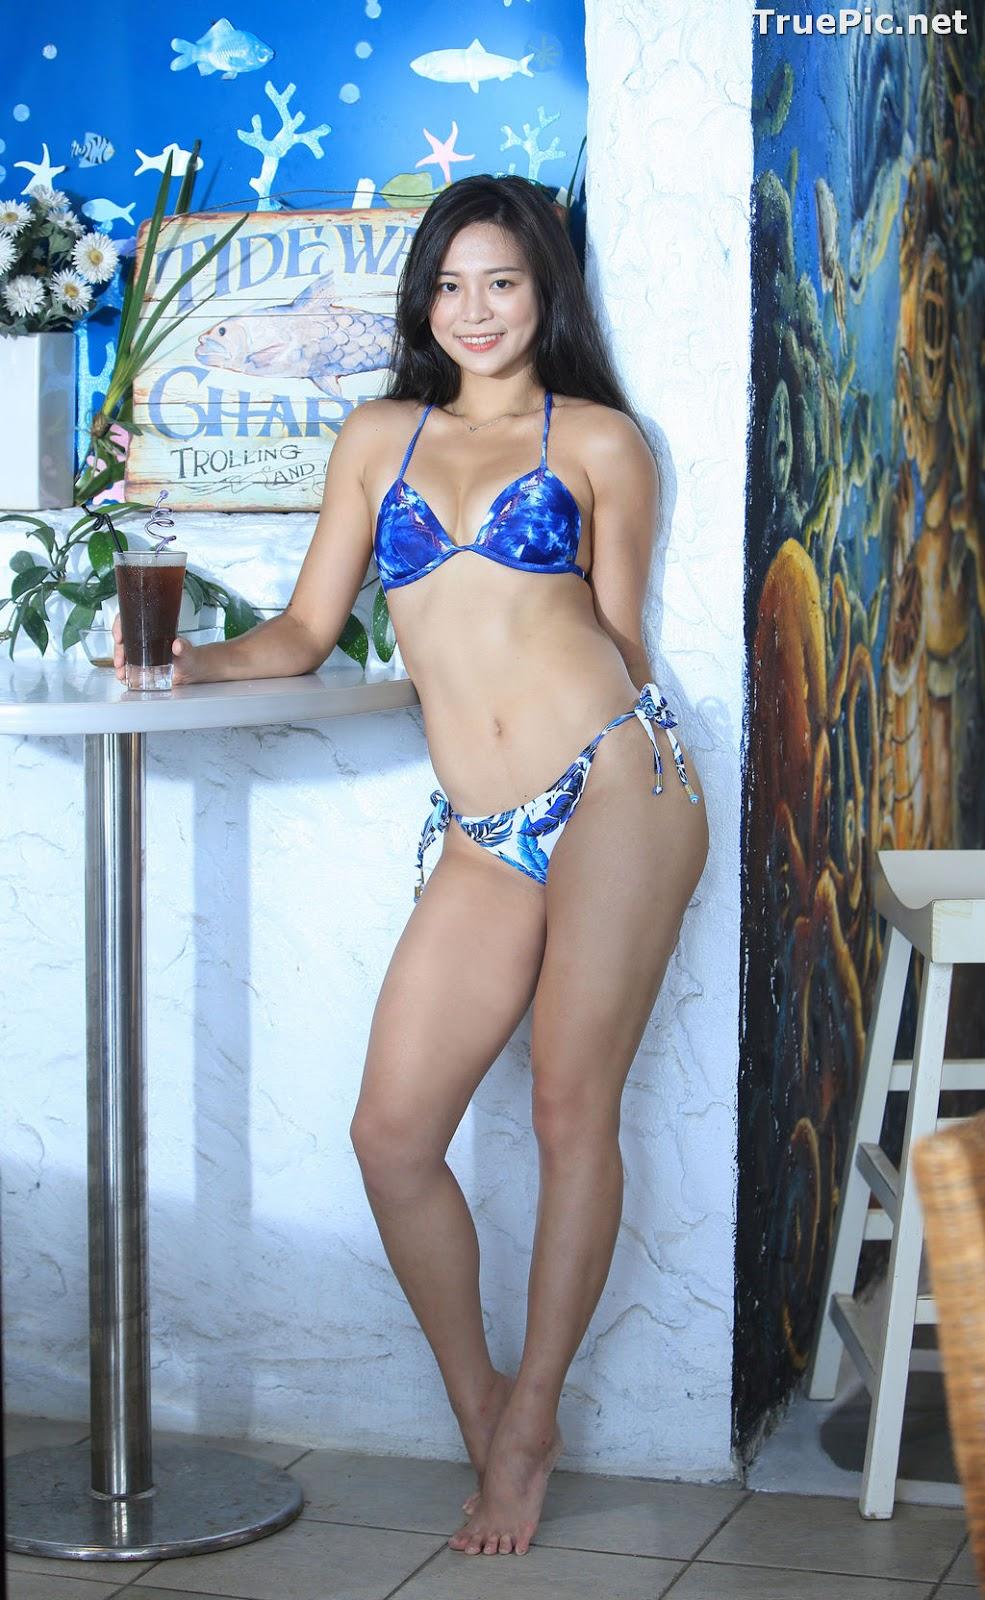 Image Taiwanese Model - Shelly - Beautiful Bodybuilding Bikini Girl - TruePic.net - Picture-48